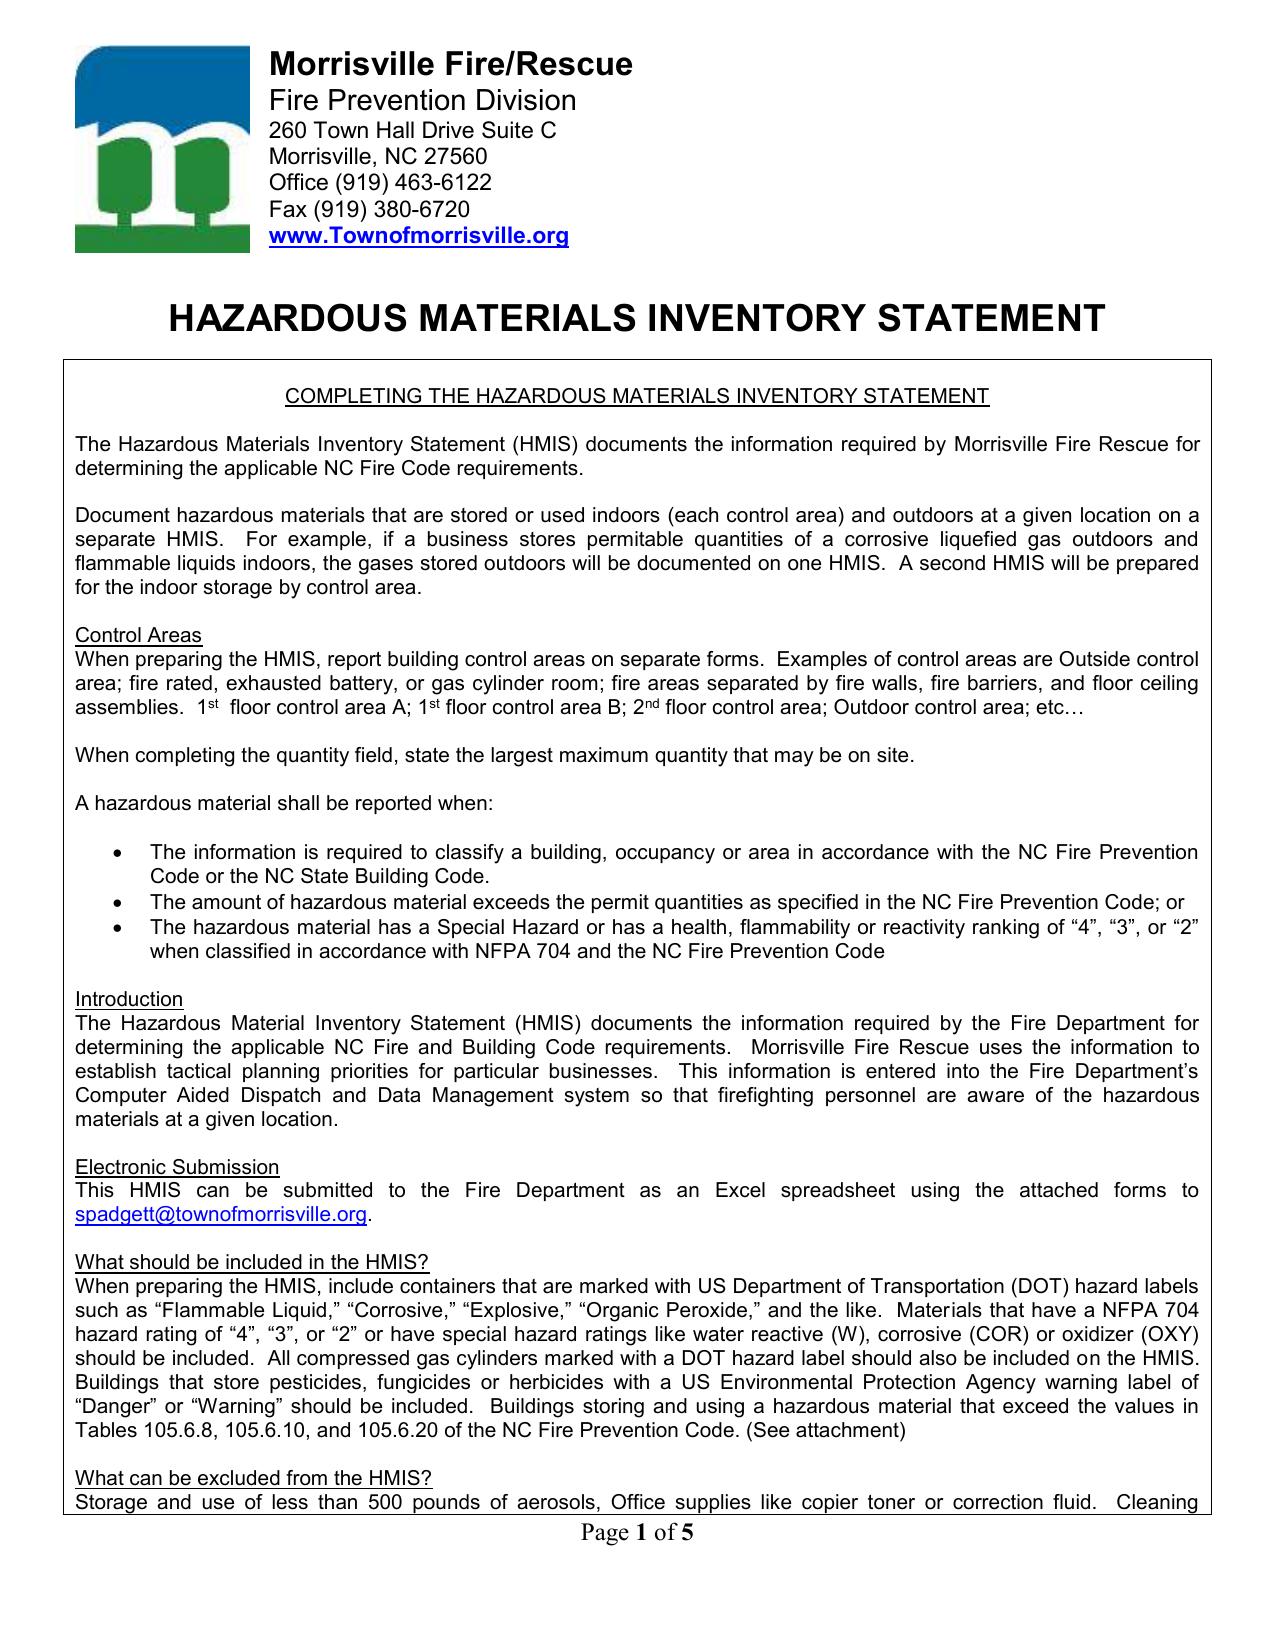 Hazardous Material Inventory Spreadsheet Inside Hazardous